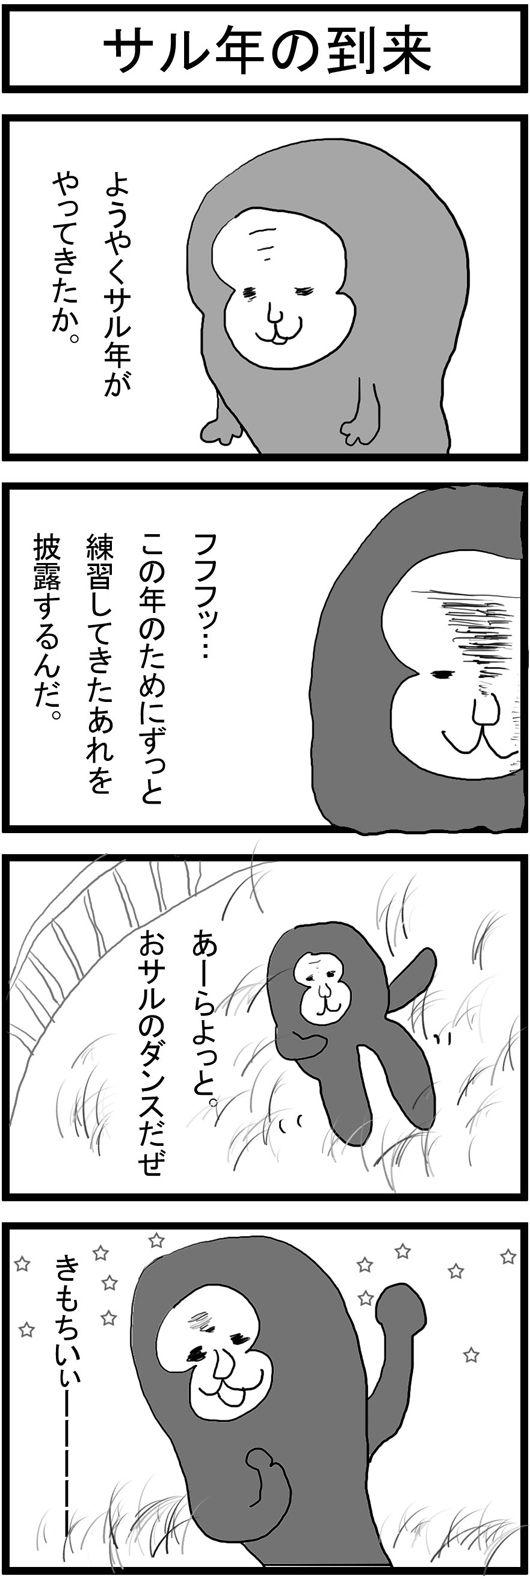 4koma-osaru